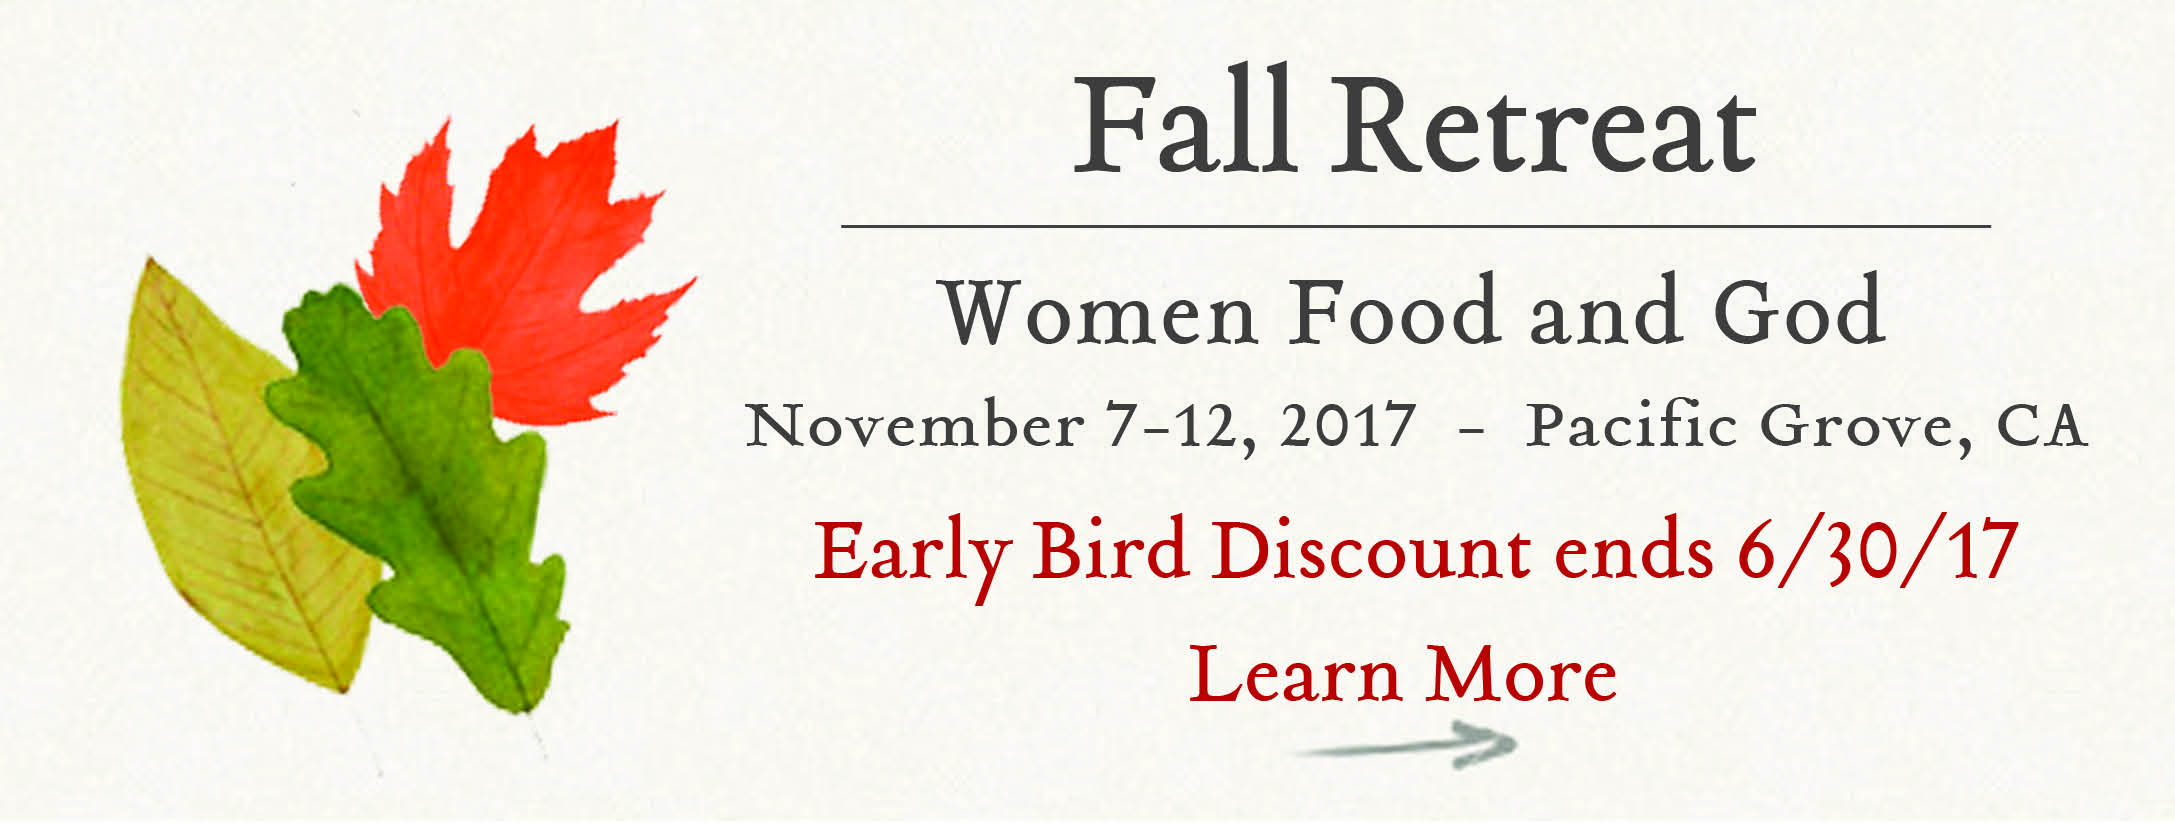 Fall Retreat TOP Slide 2017